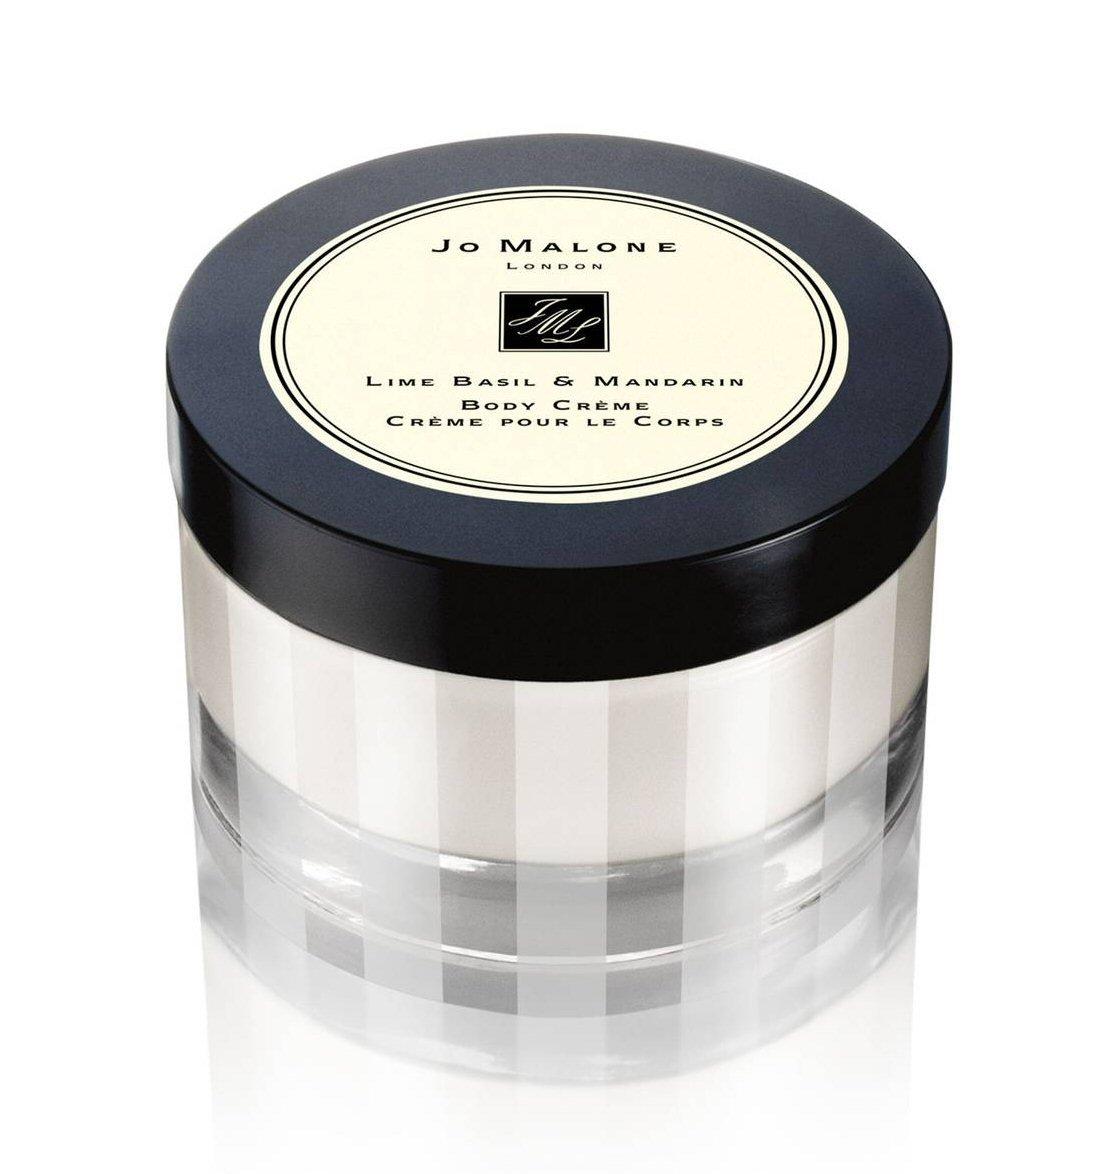 Brand New in Box Jo Malone London Lime Basil & Mandarin Body Crème 5.9 oz / 175 ml